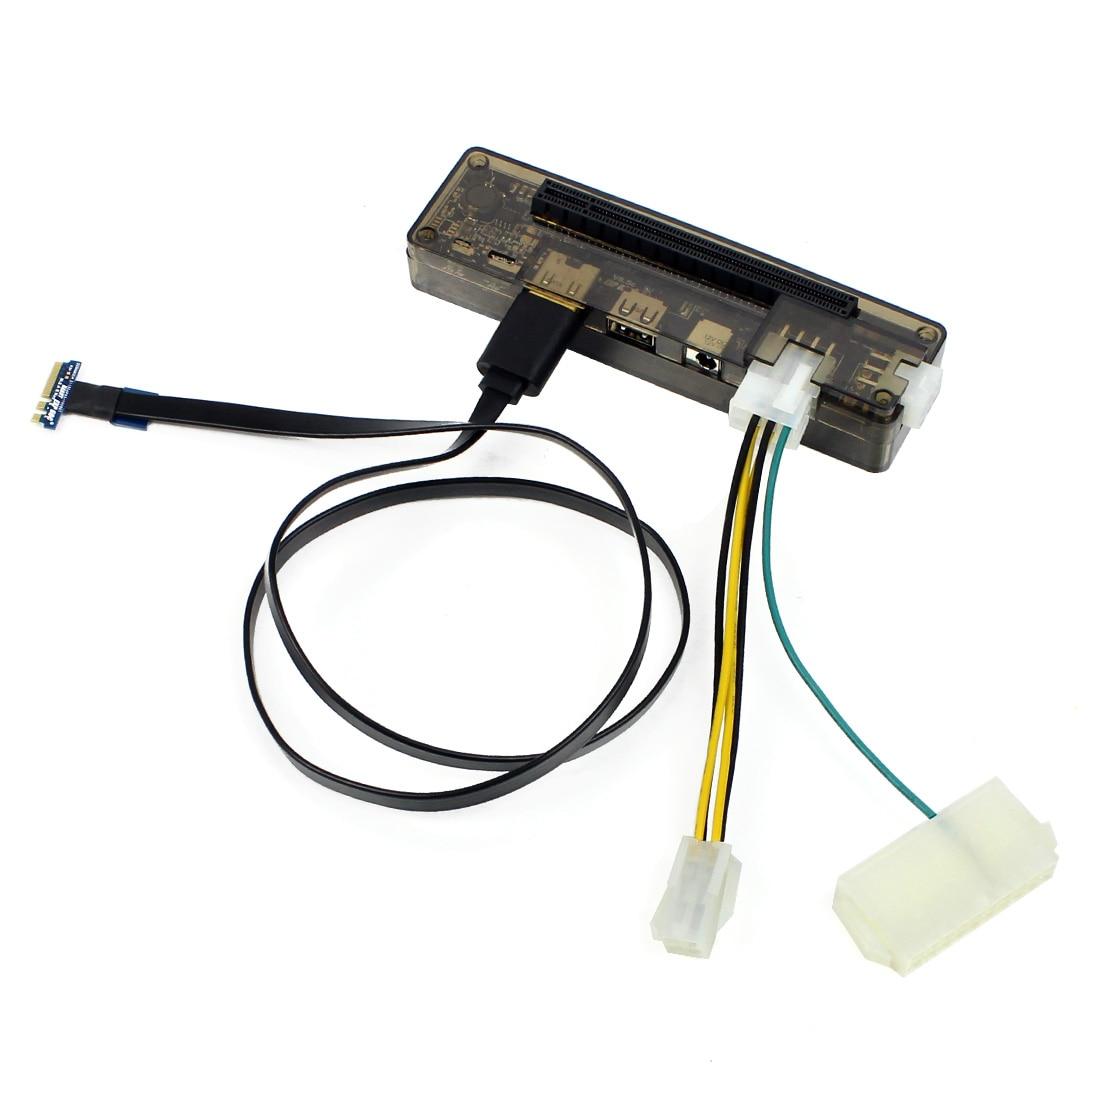 EXP GDC External Laptop Video Card Mini PCI-E /NGFF M.2 A Key Interface Version Graphics Card Docking Station